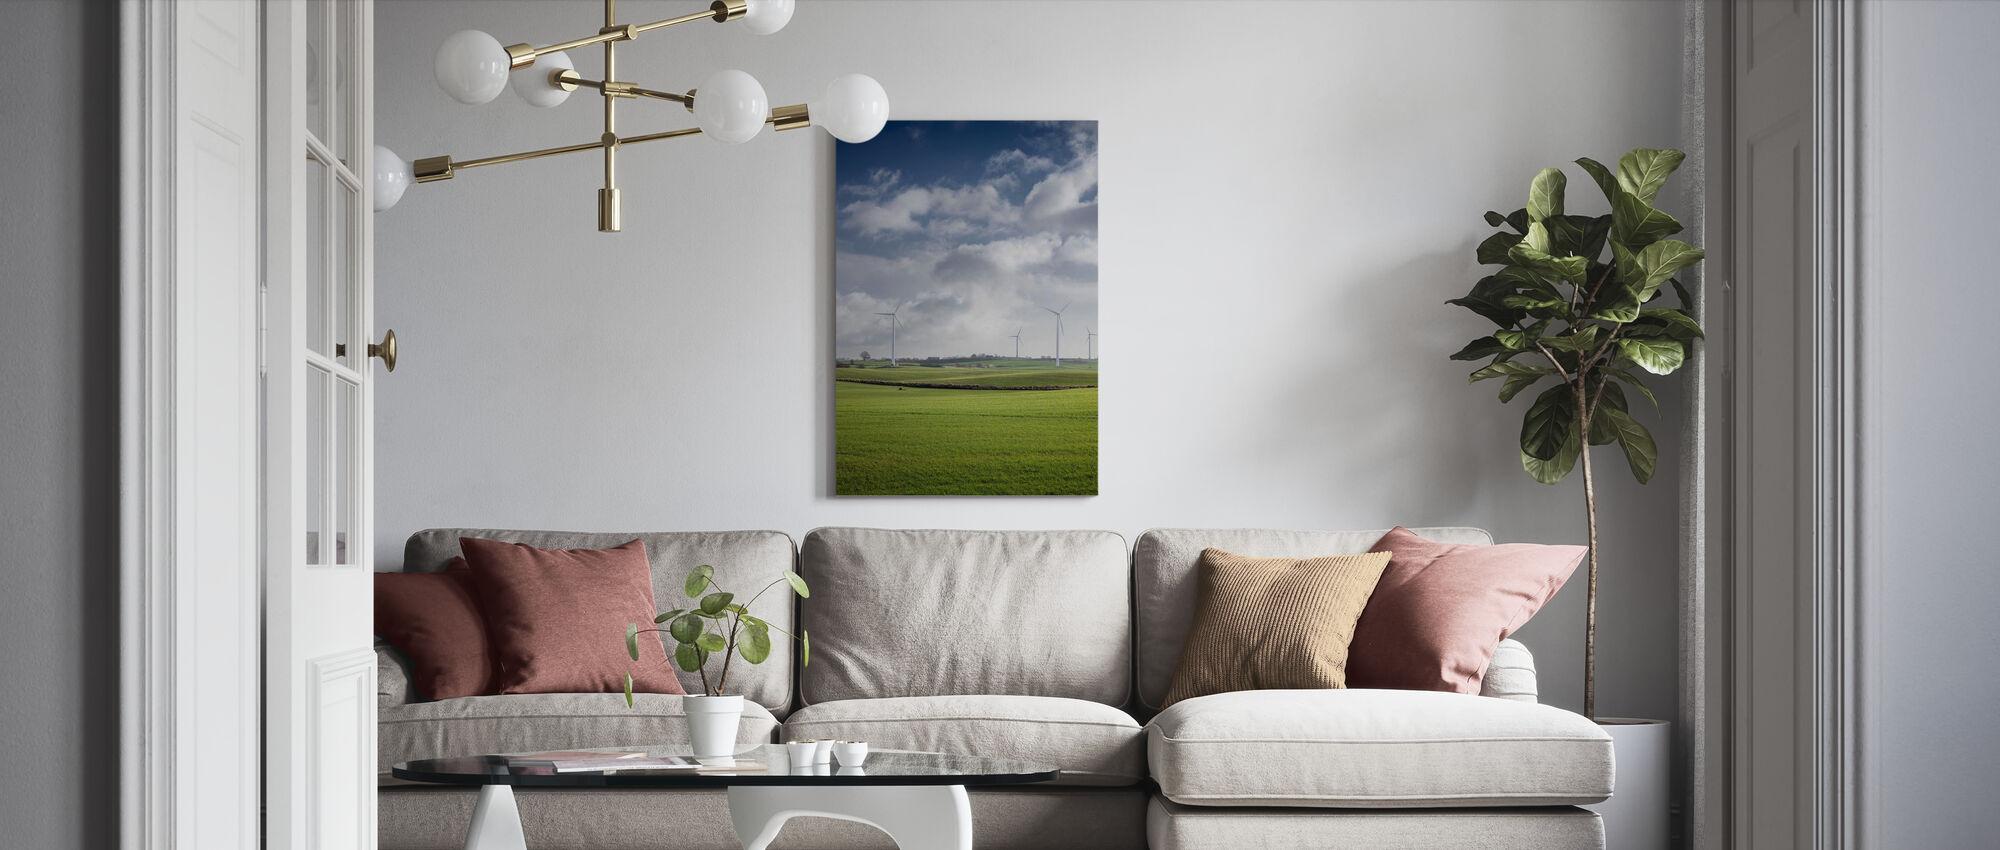 Windmill in Green Fields of Skåne, Sweden - Canvas print - Living Room